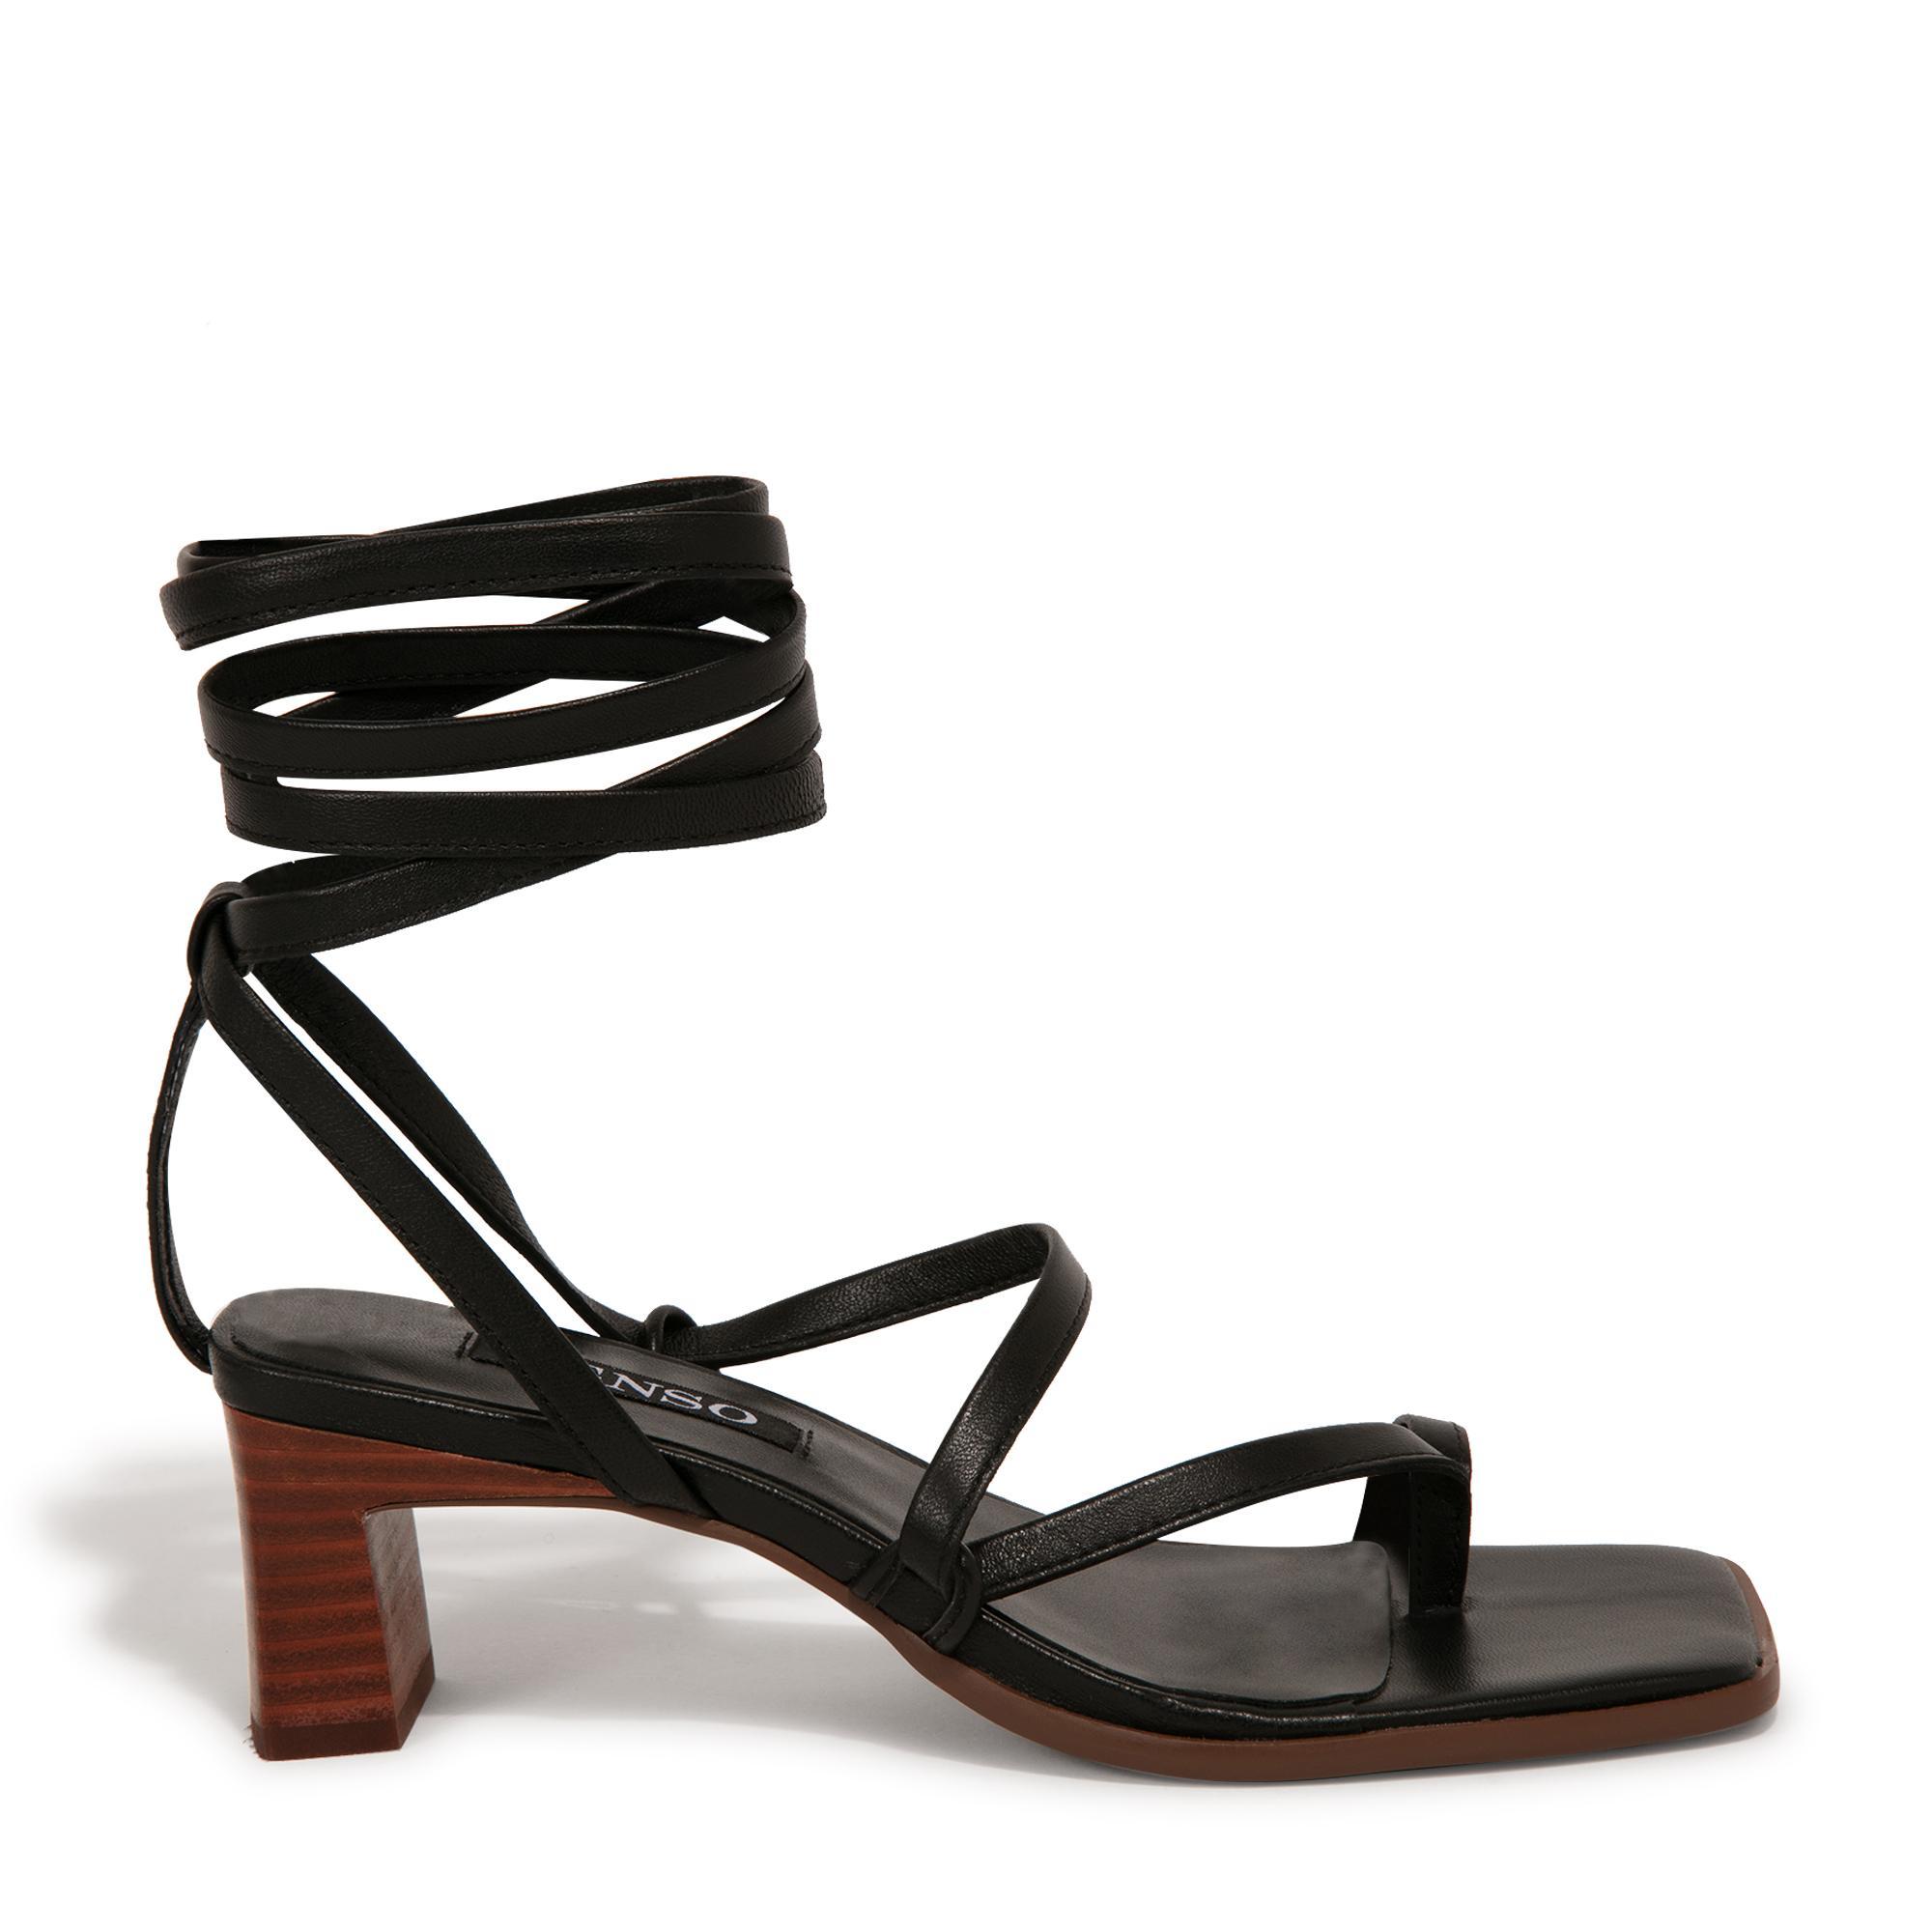 Raegan sandals